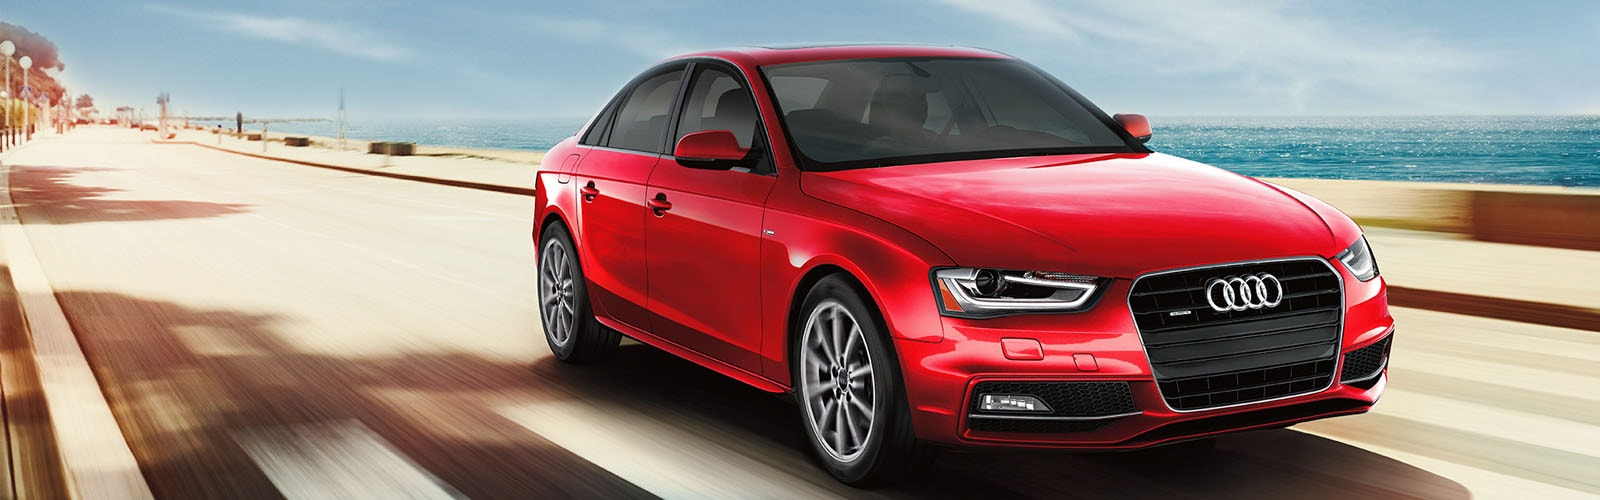 South Florida Audi Dealers New Audi Dealership In - Audi dealers florida